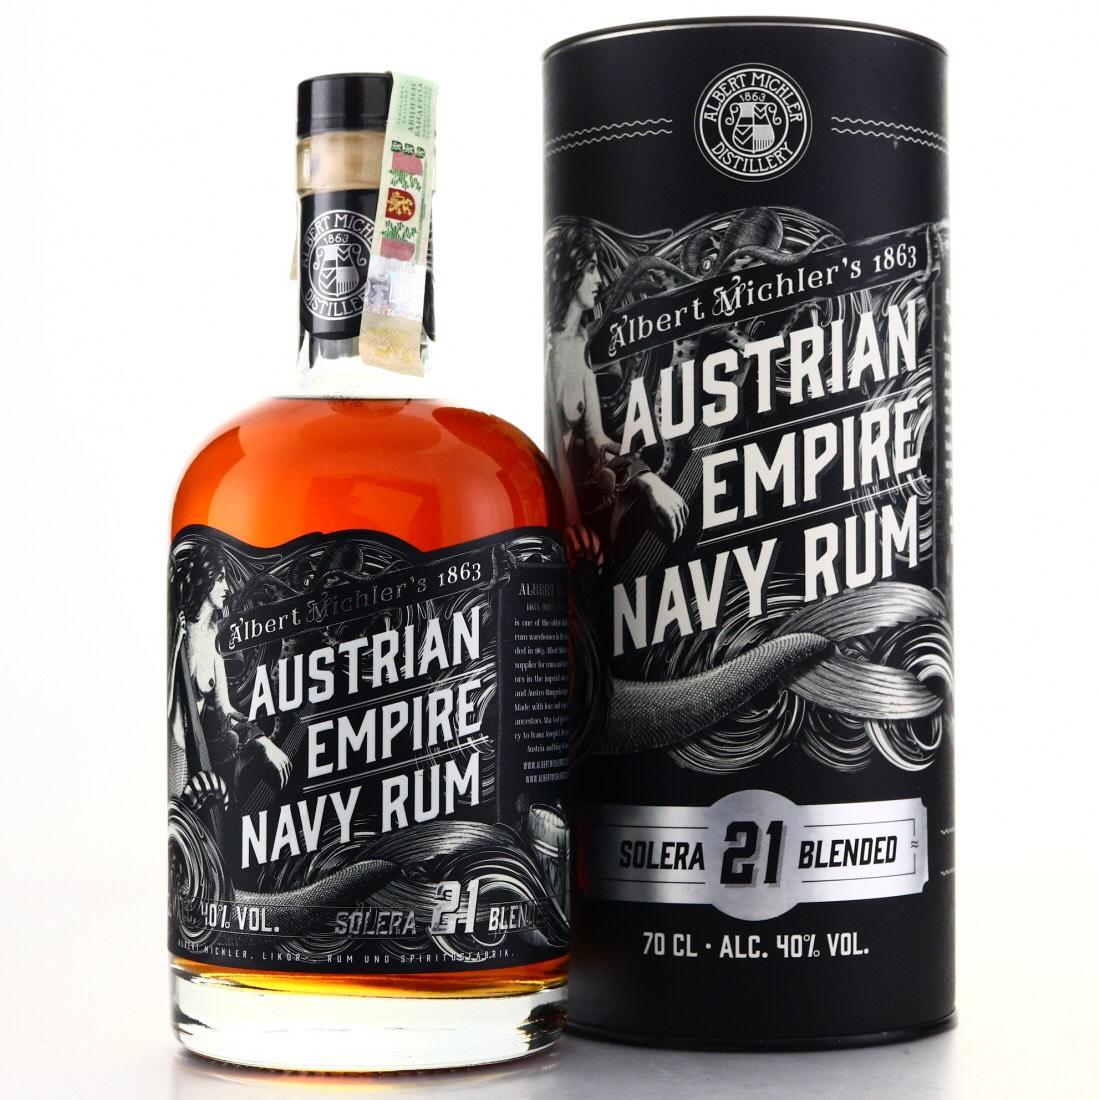 Bottle image of Austrian Empire Navy Rum Solera 21